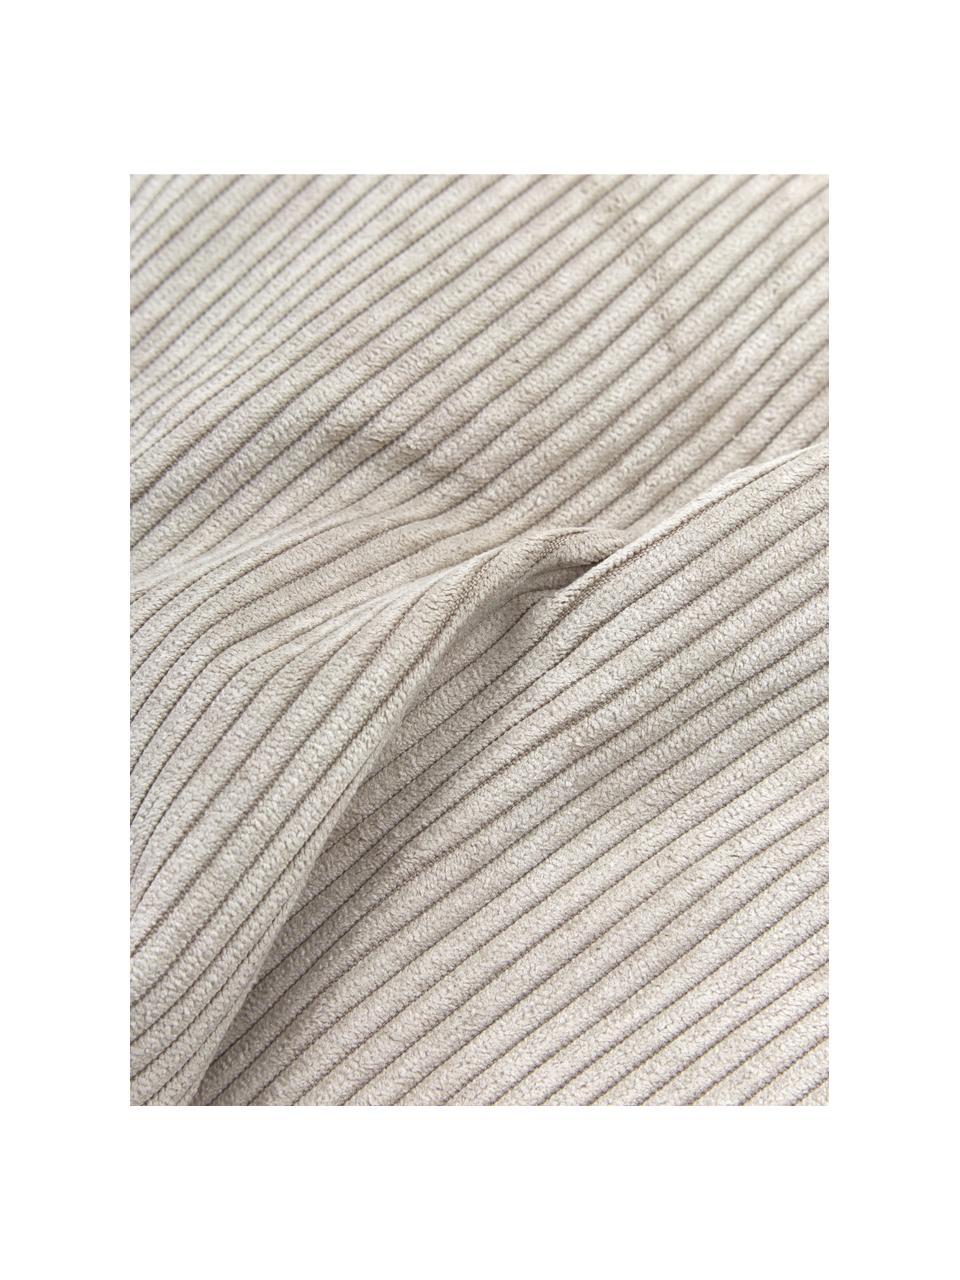 Sofa-Kissen Lennon in Beige aus Cord, Bezug: Cord (92% Polyester, 8% P, Cord Beige, 60 x 60 cm